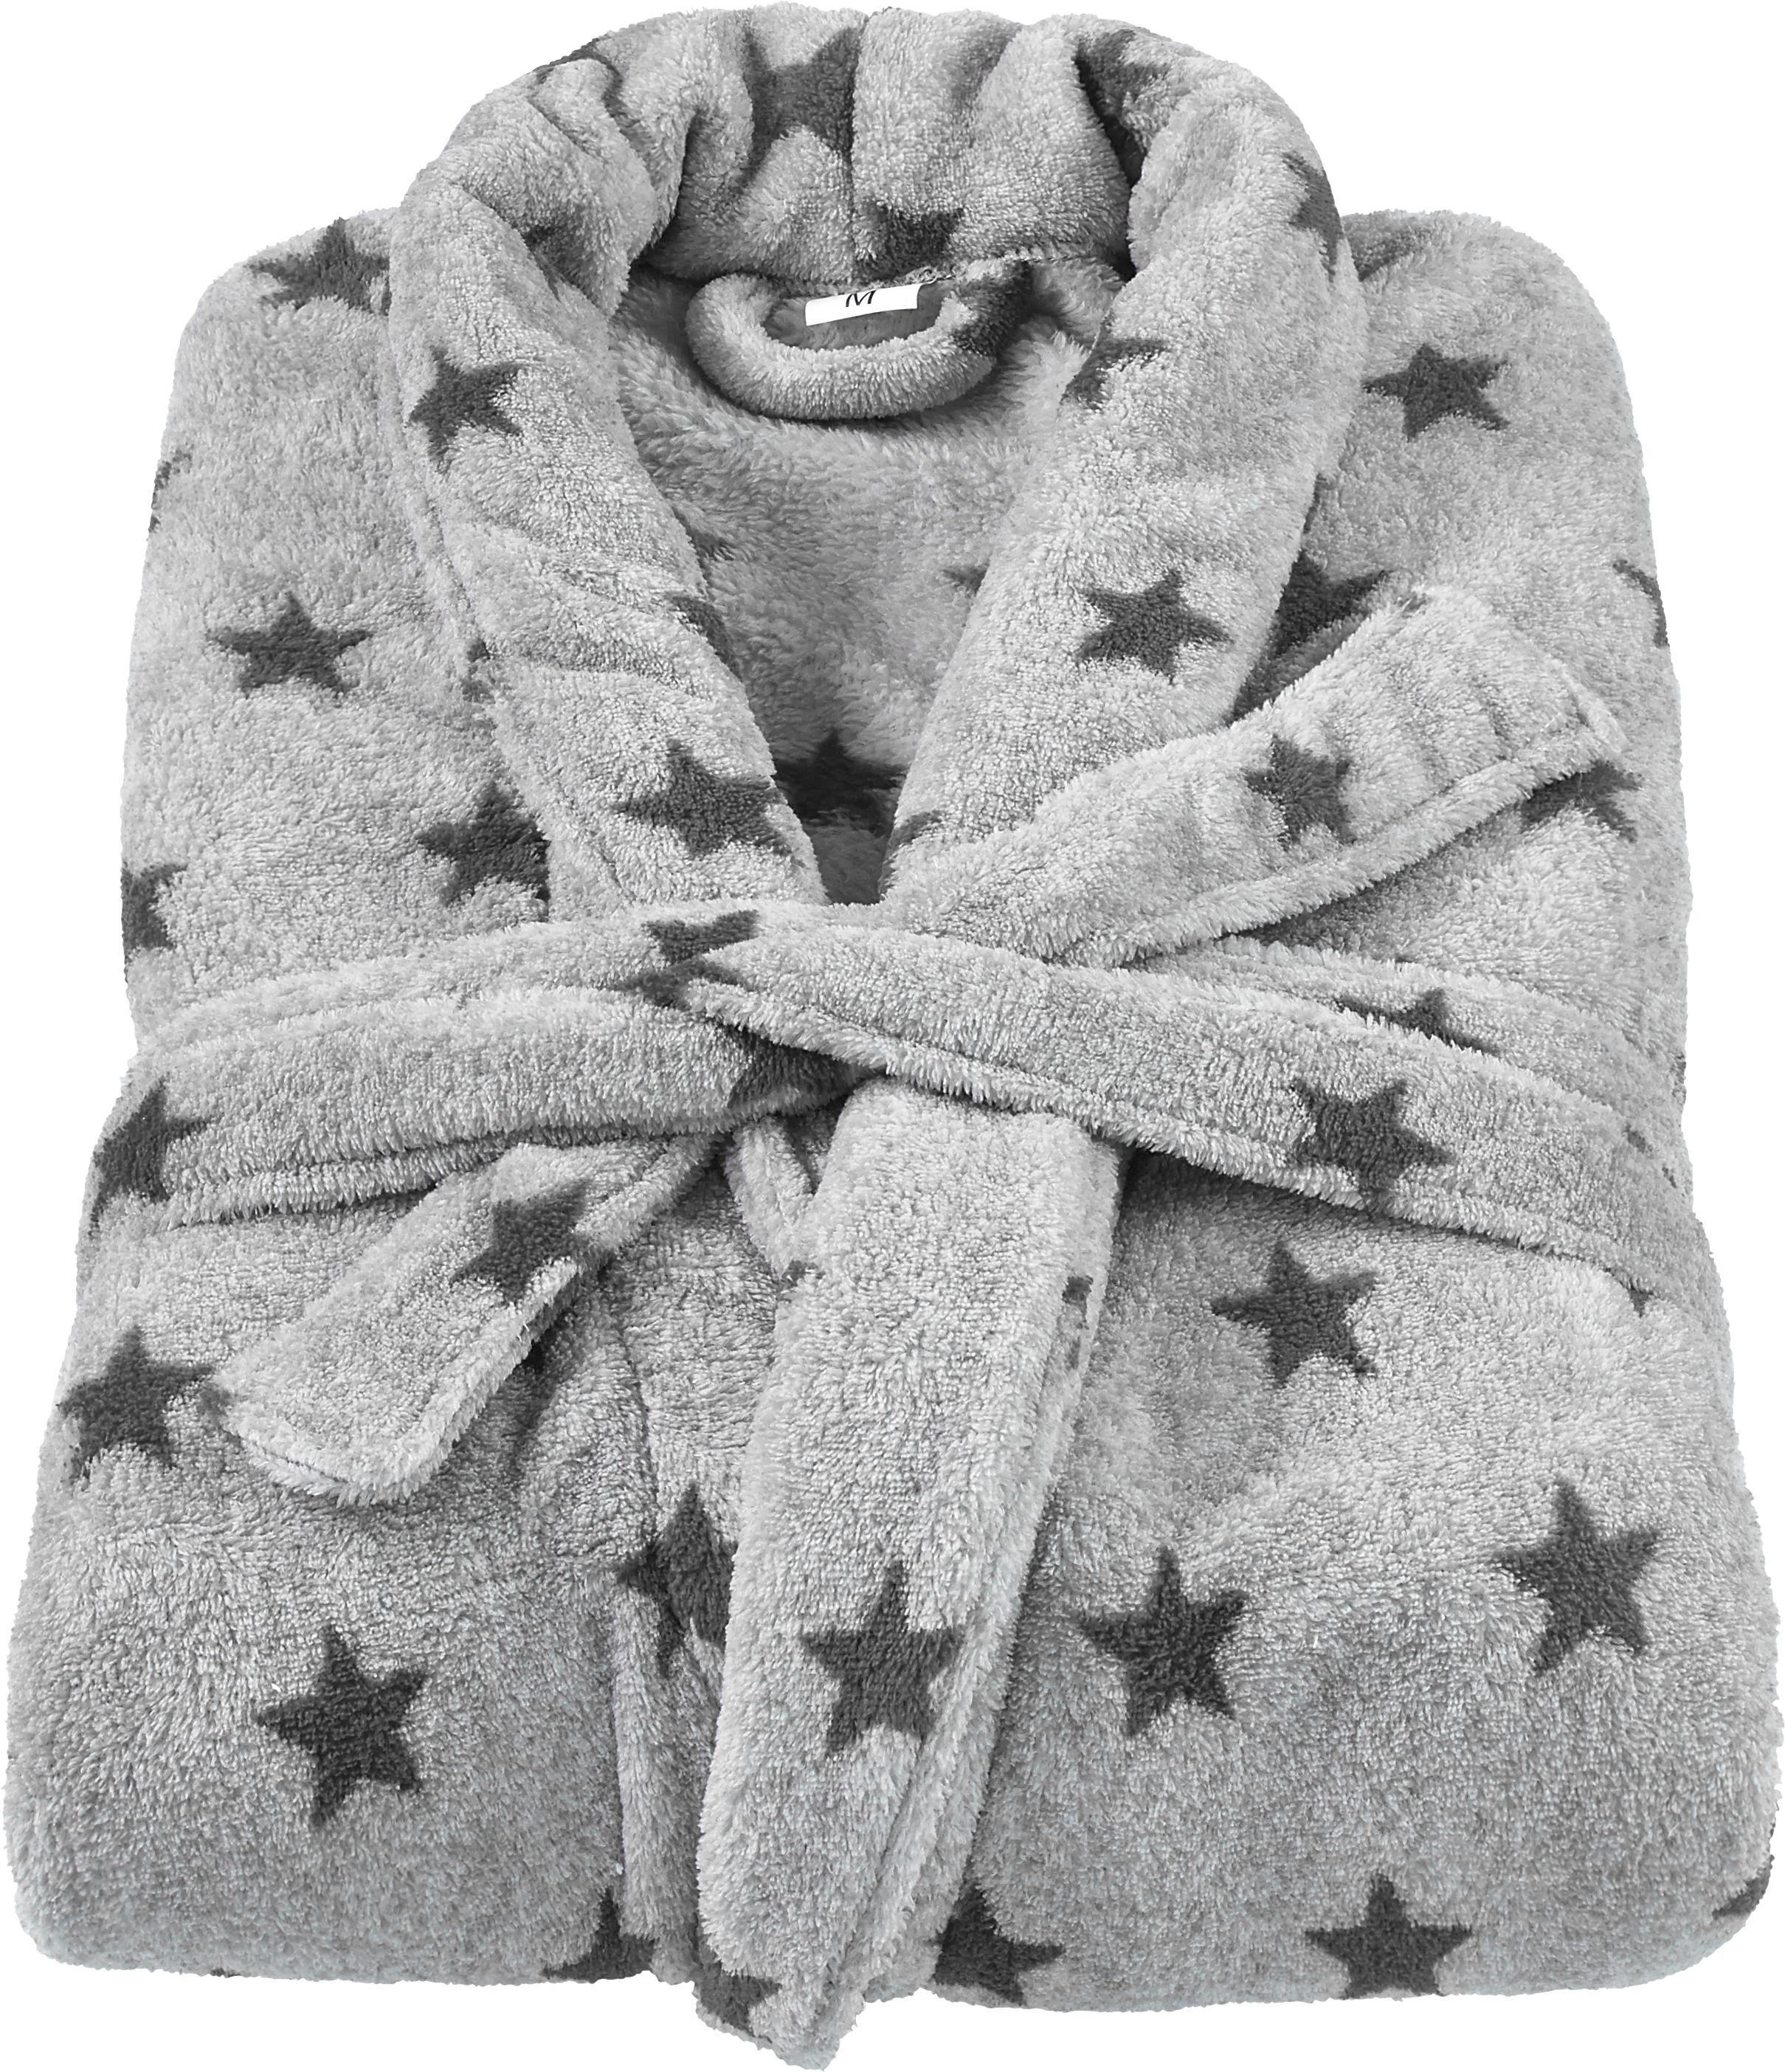 Bademantel Sterne in Grau mit Sternen - Dunkelgrau/Grau, Textil (S-L) - MÖMAX modern living